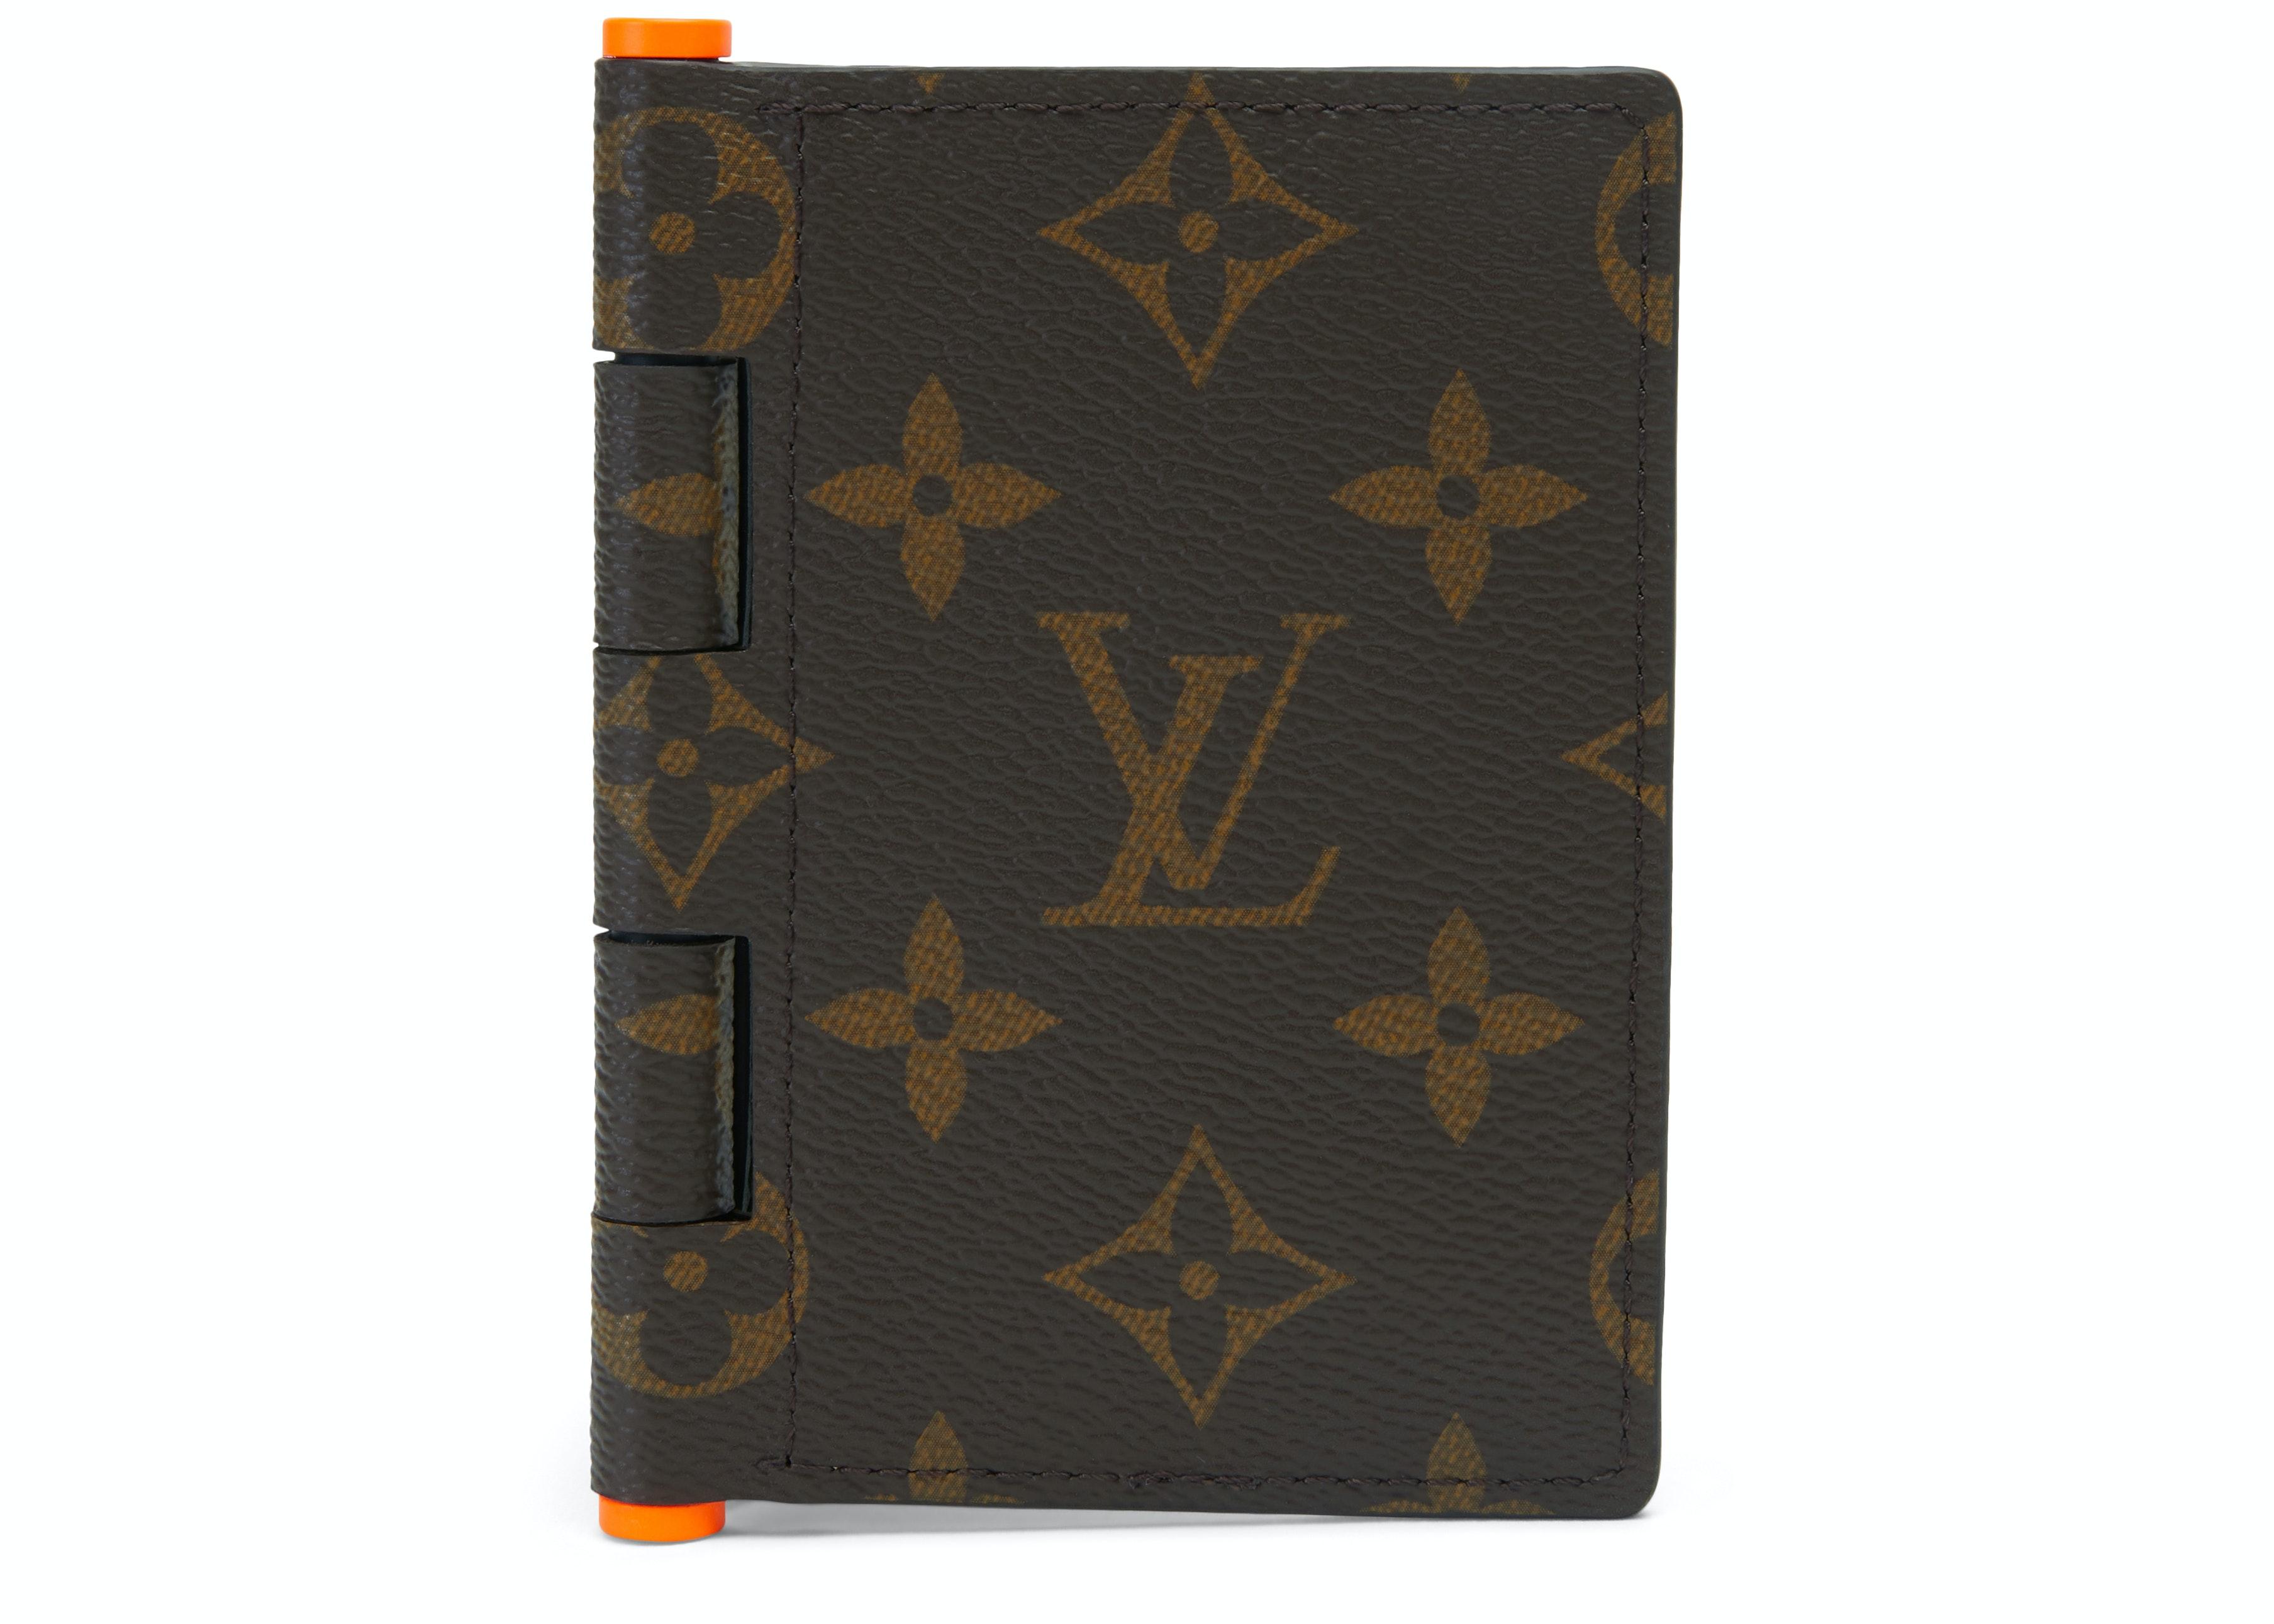 Louis Vuitton Pocket Organizer Monogram Solar Ray Orange Brown